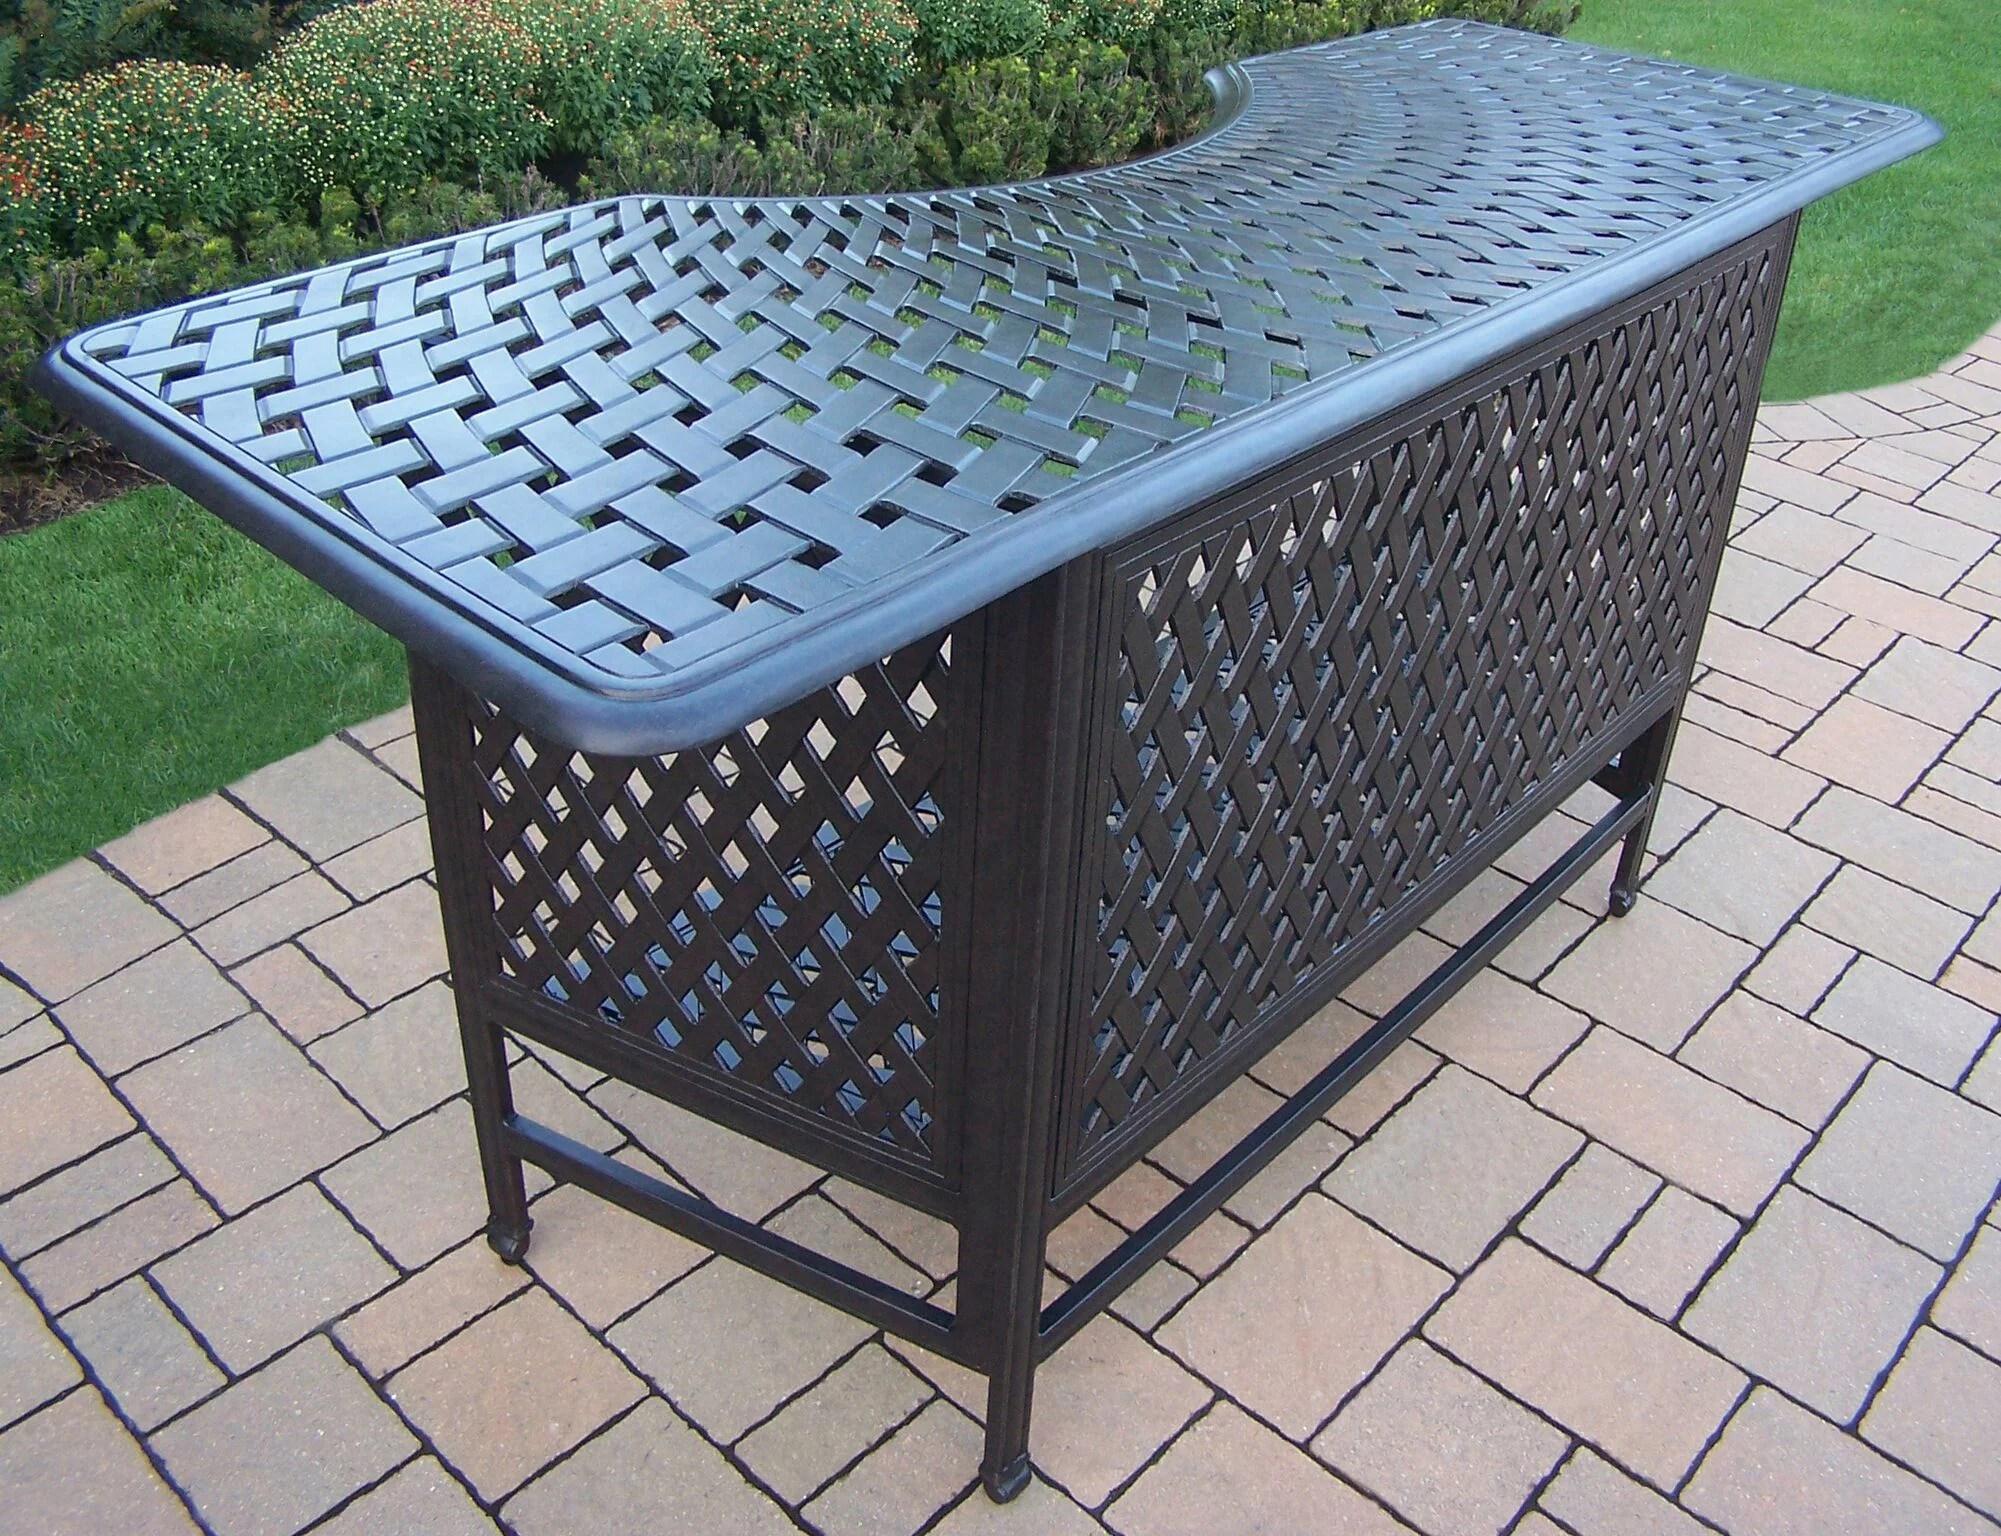 80 jet black contemporary motif outdoor patio bar table